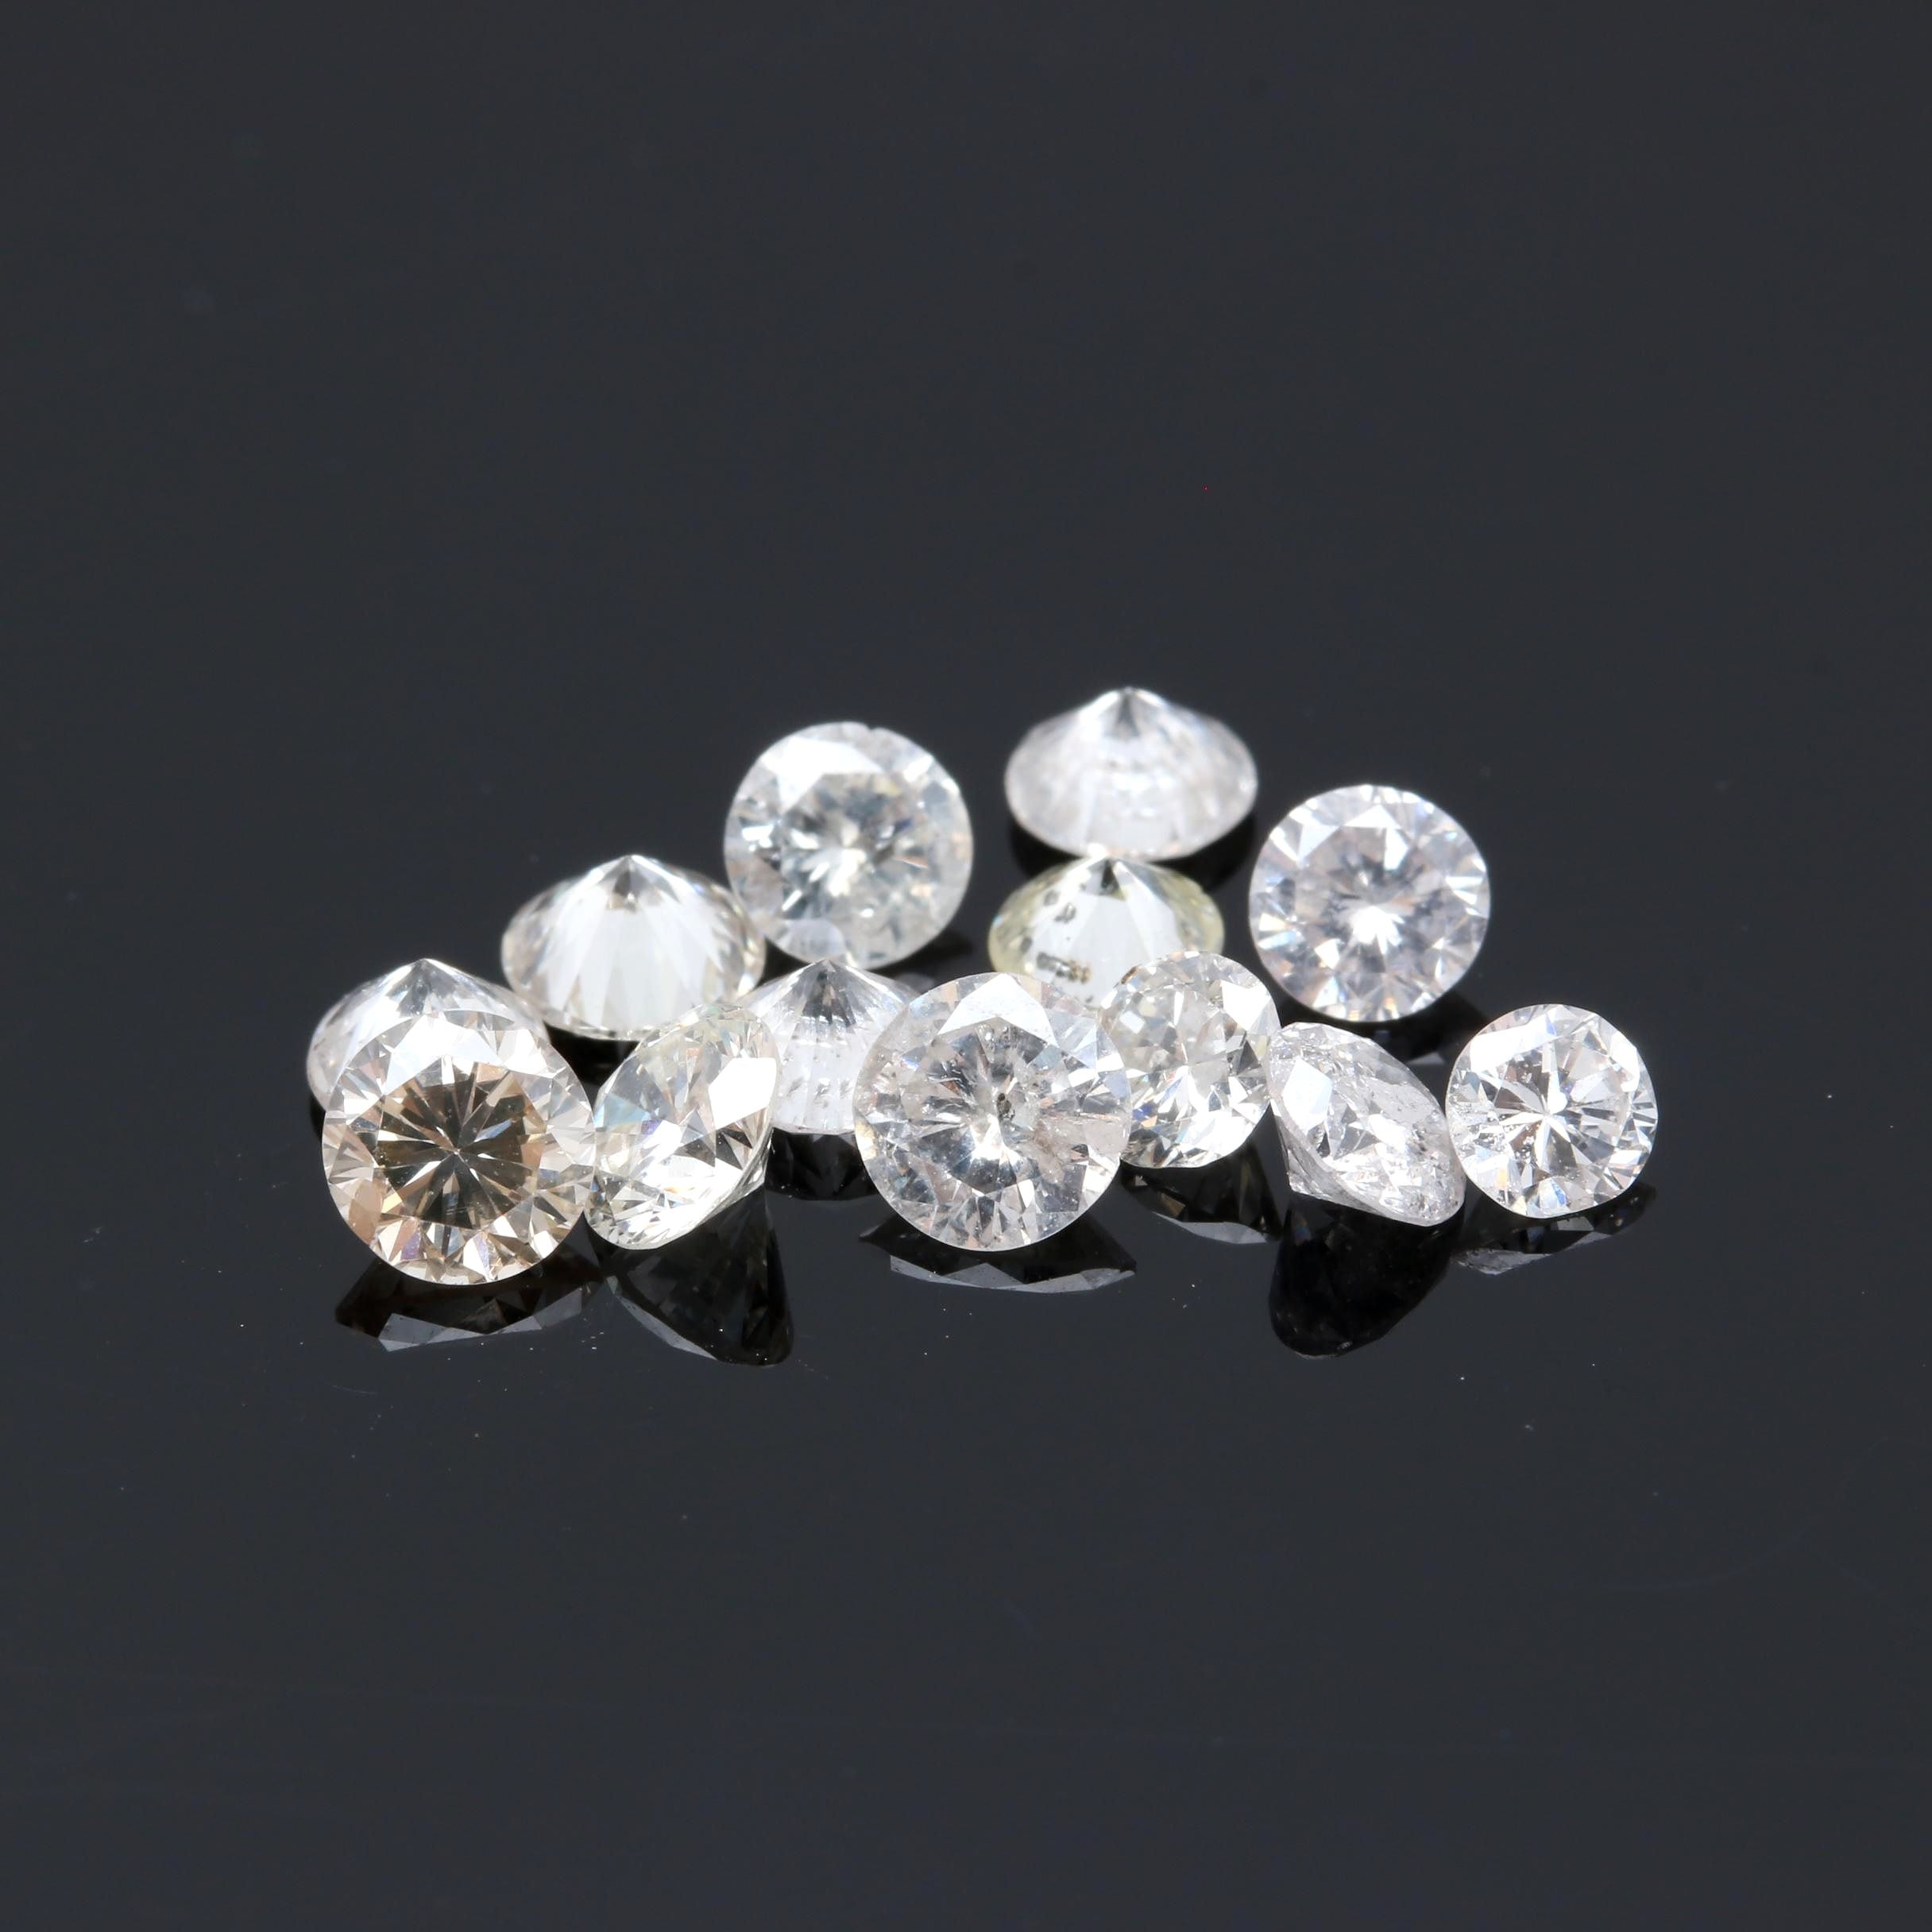 2.67 CTW Loose Diamonds